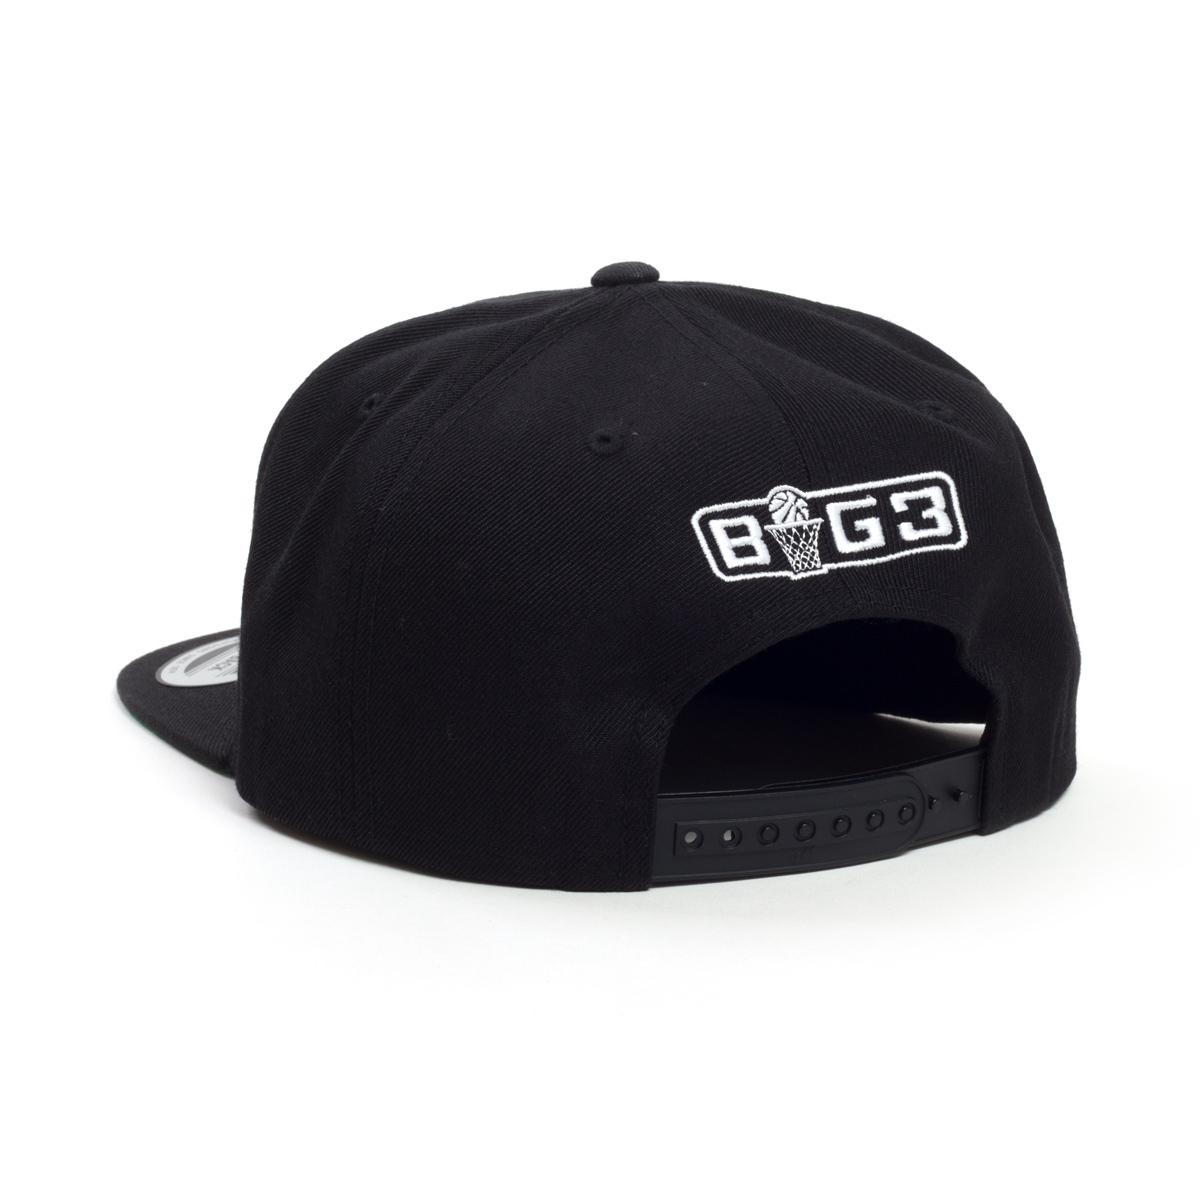 Trilogy - Black Flatbrim Hat